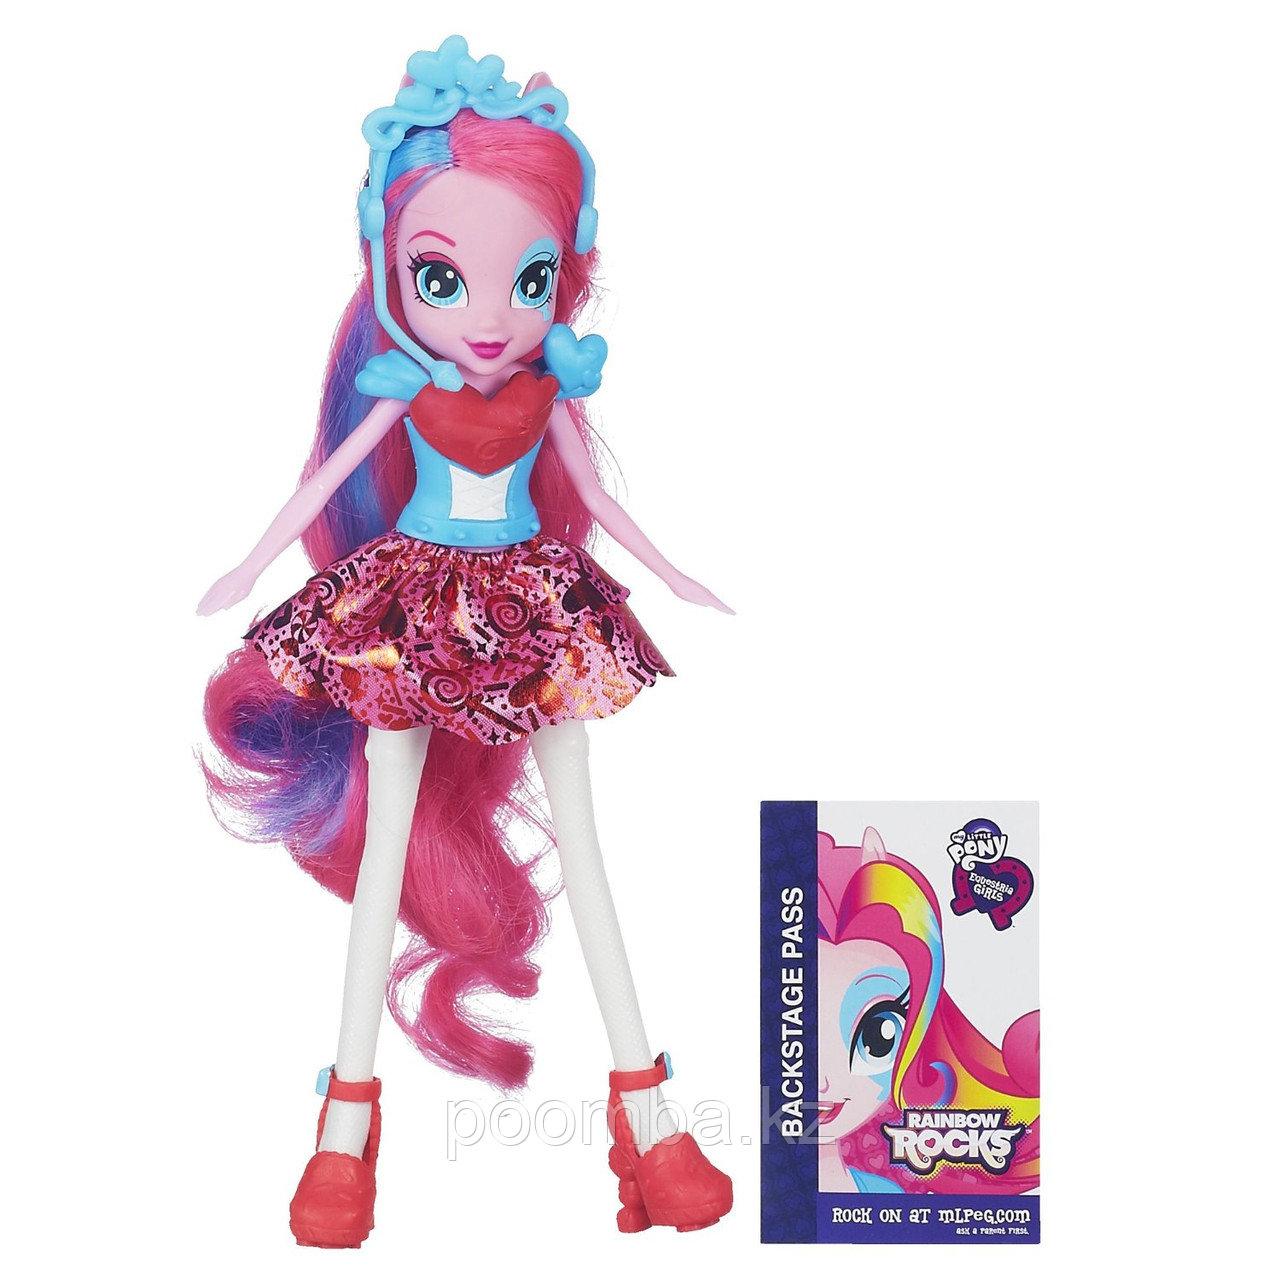 Кукла My Little Pony Equestria Girls - Пинки Пай с наушниками